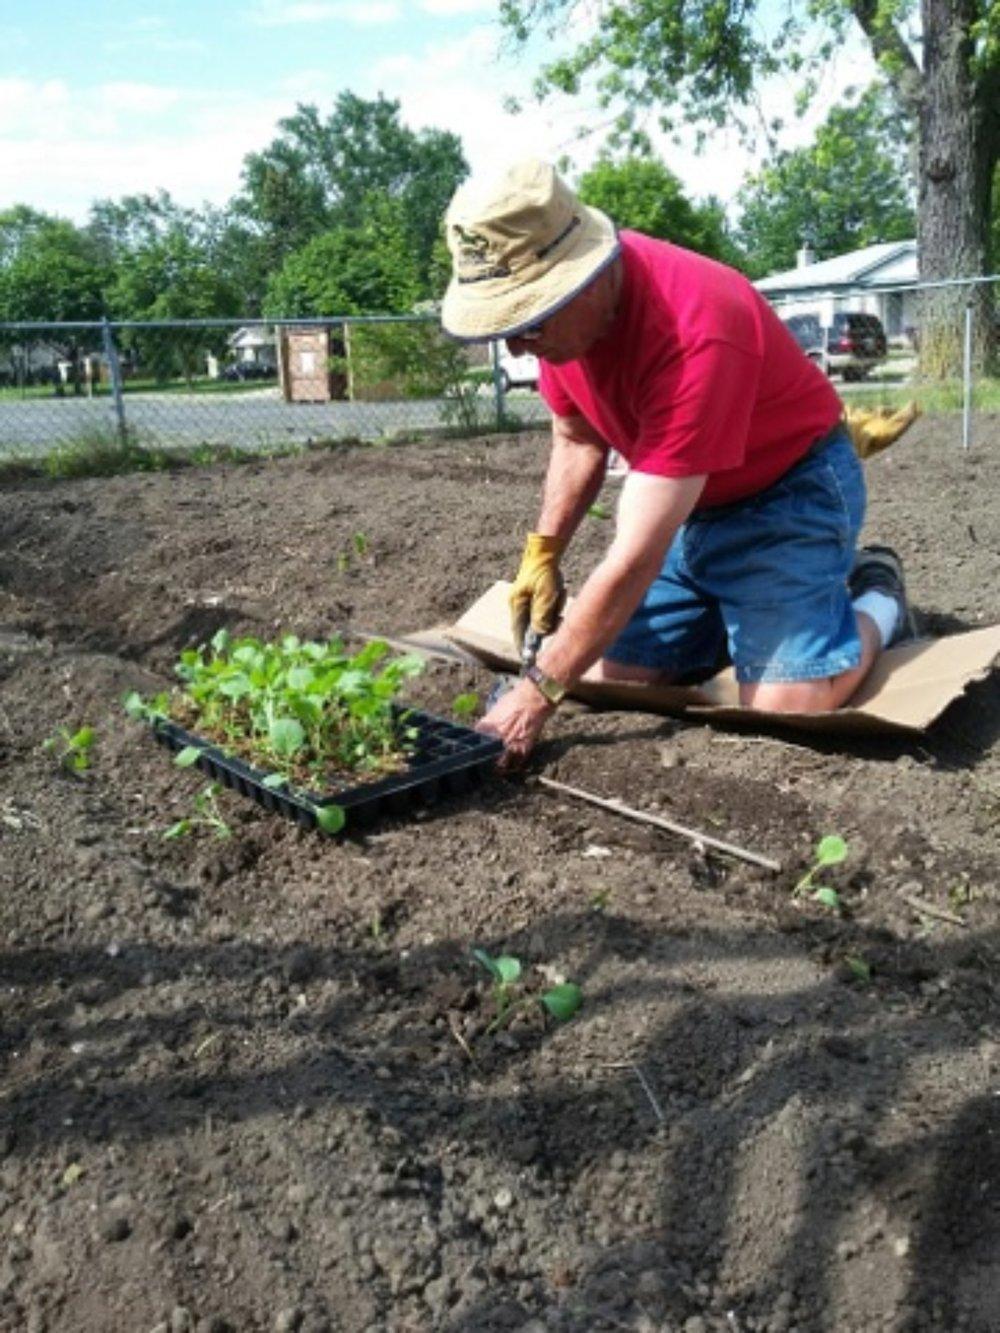 sppc_gardening_07.jpg